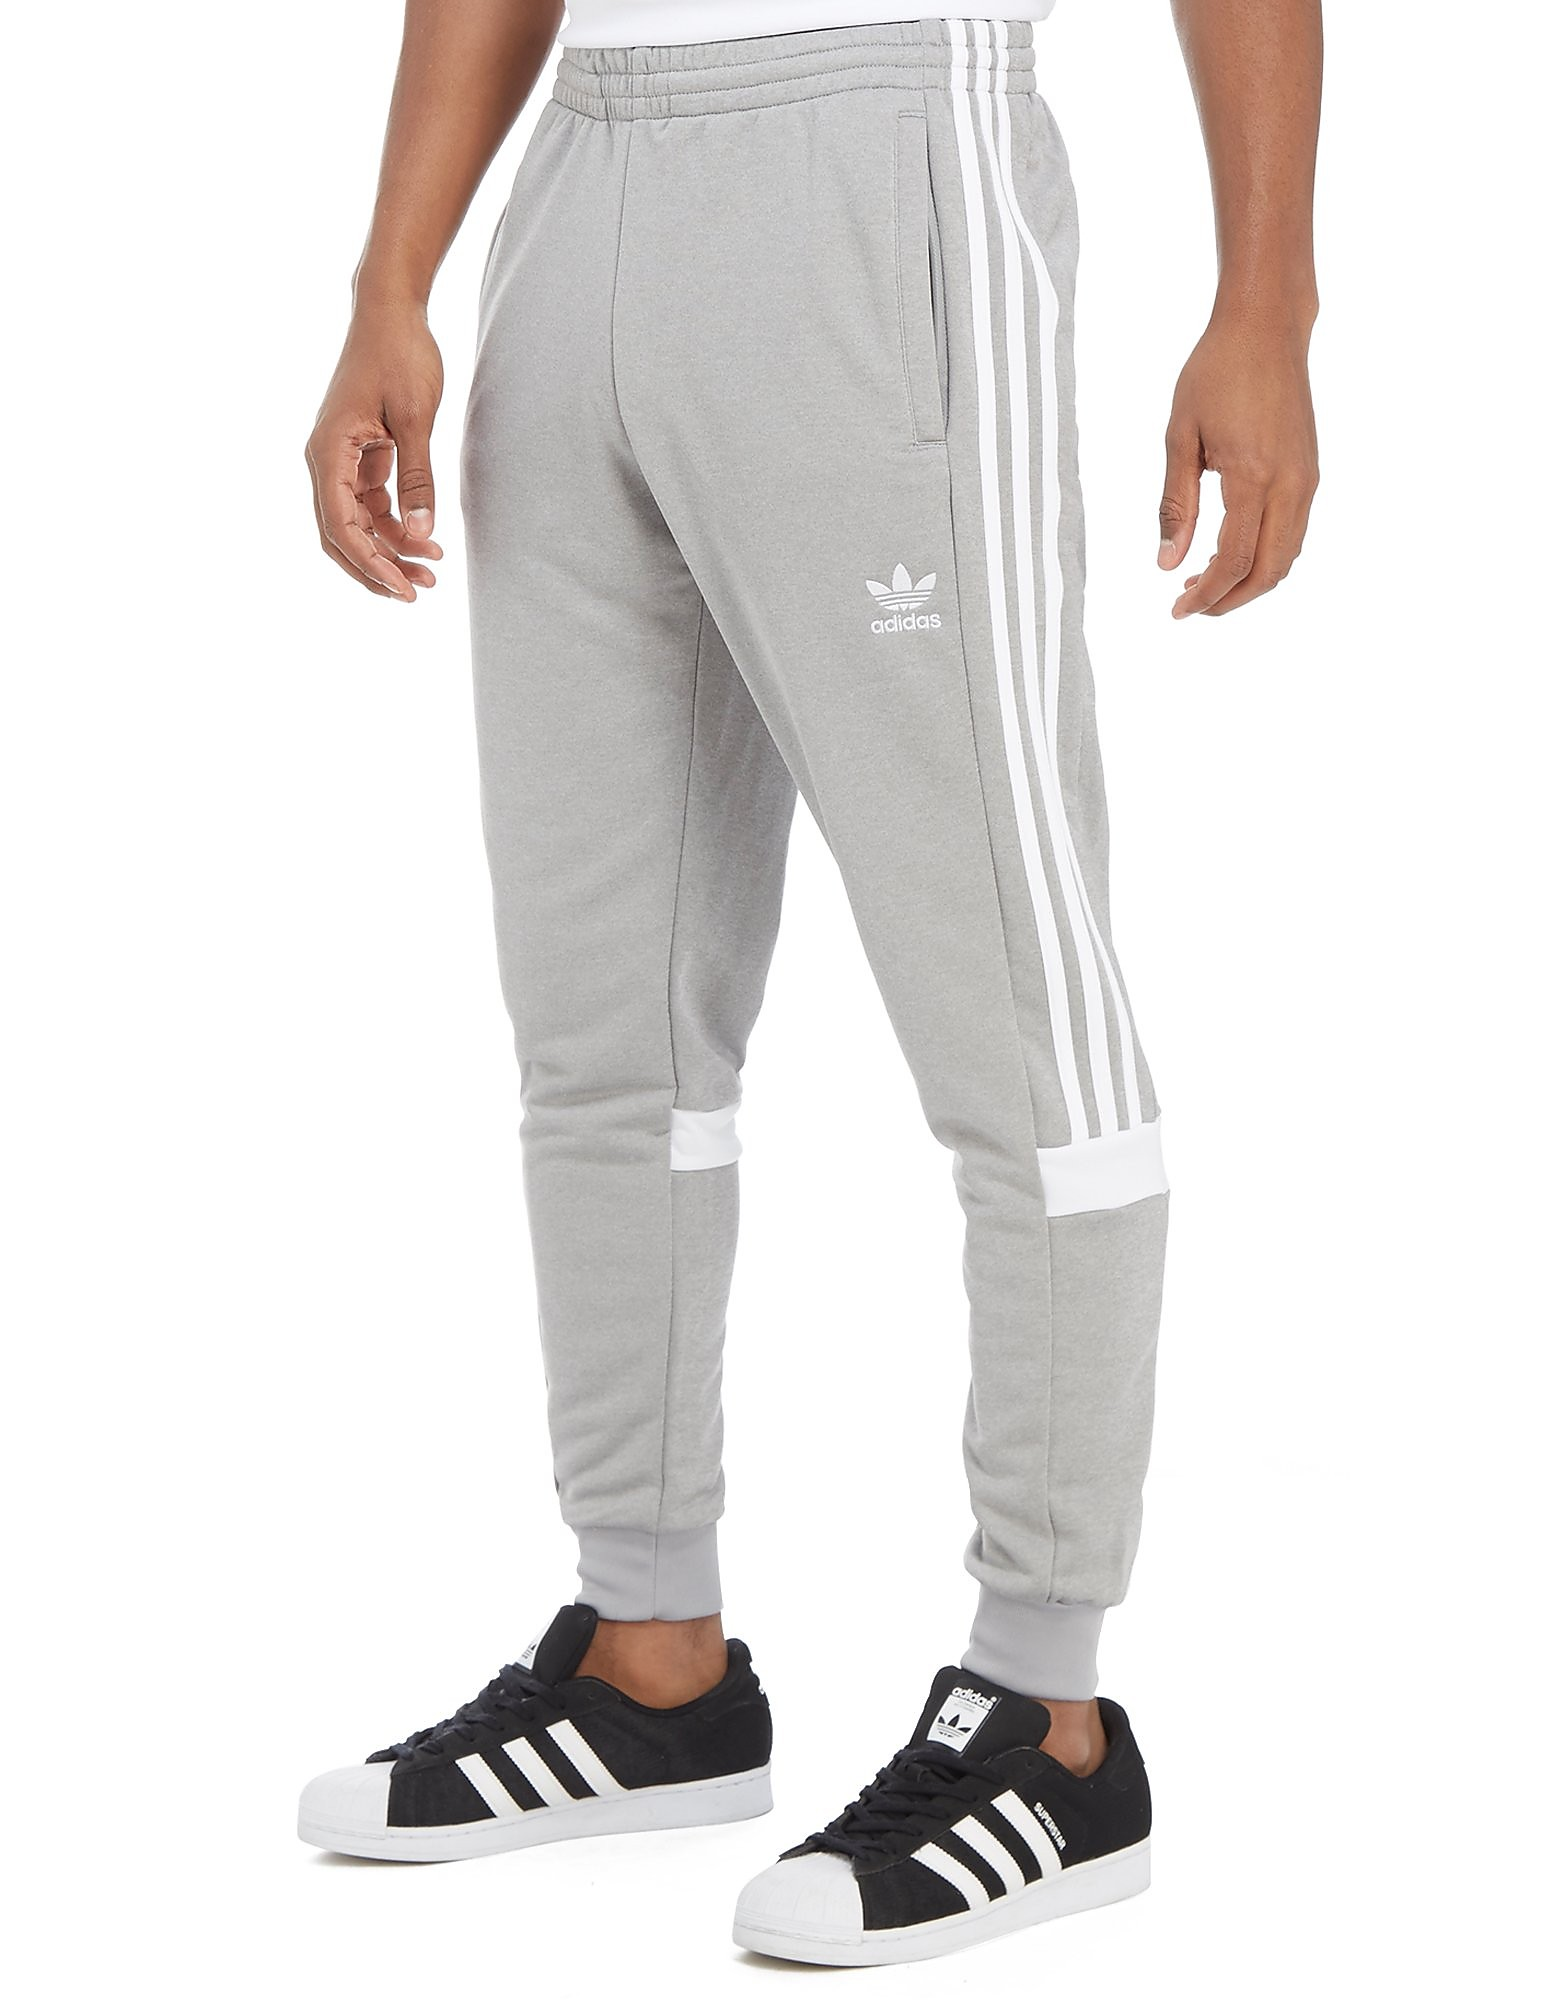 adidas Originals Superstar Colourblock Pants